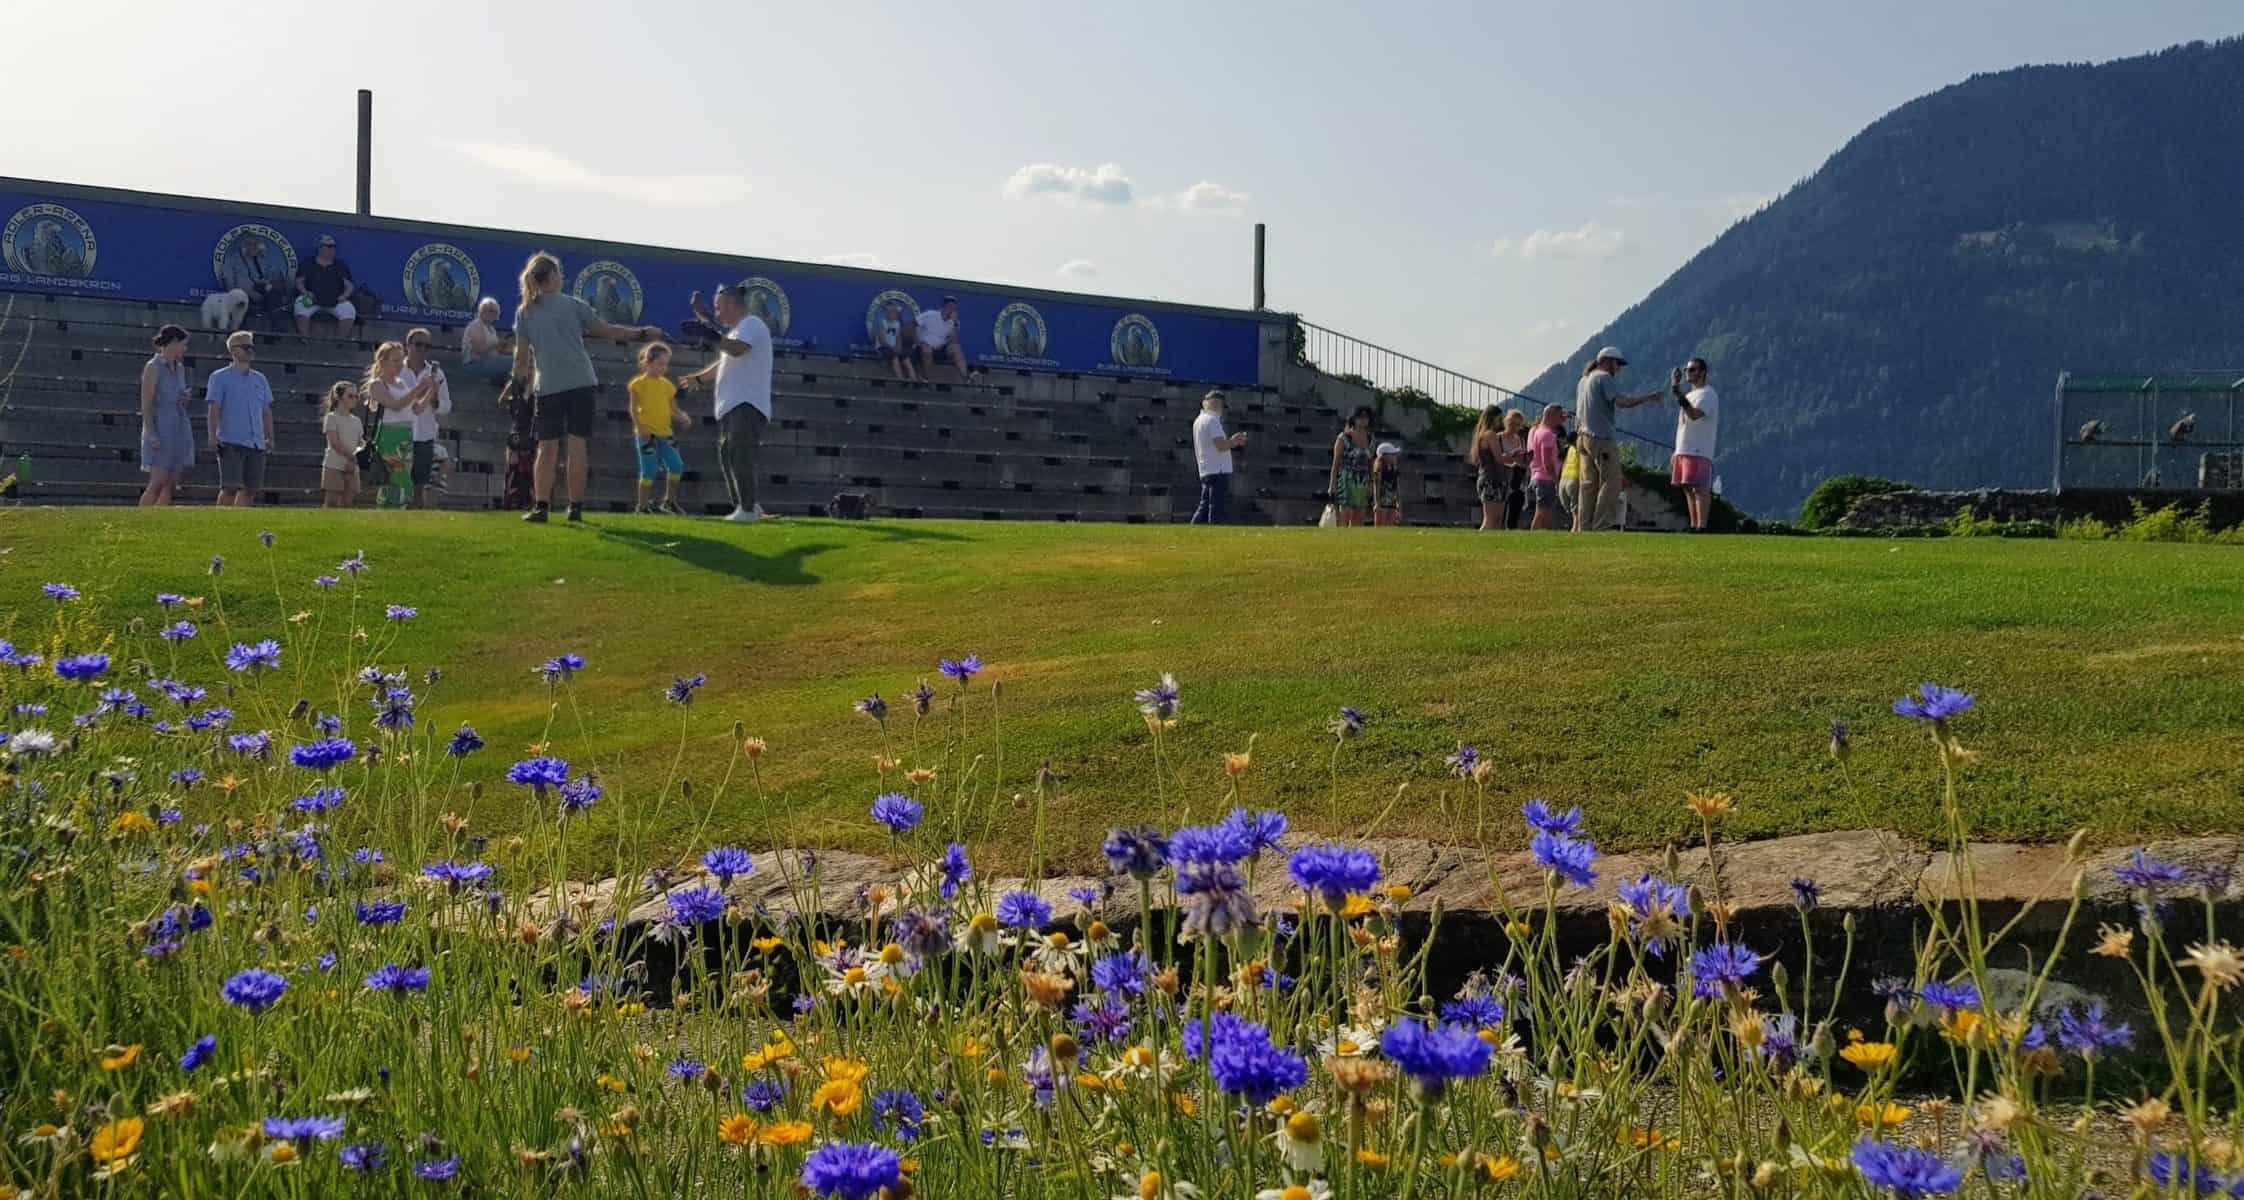 Adlerarena Burg Landskron im Sommer nach der Greifvogelschau